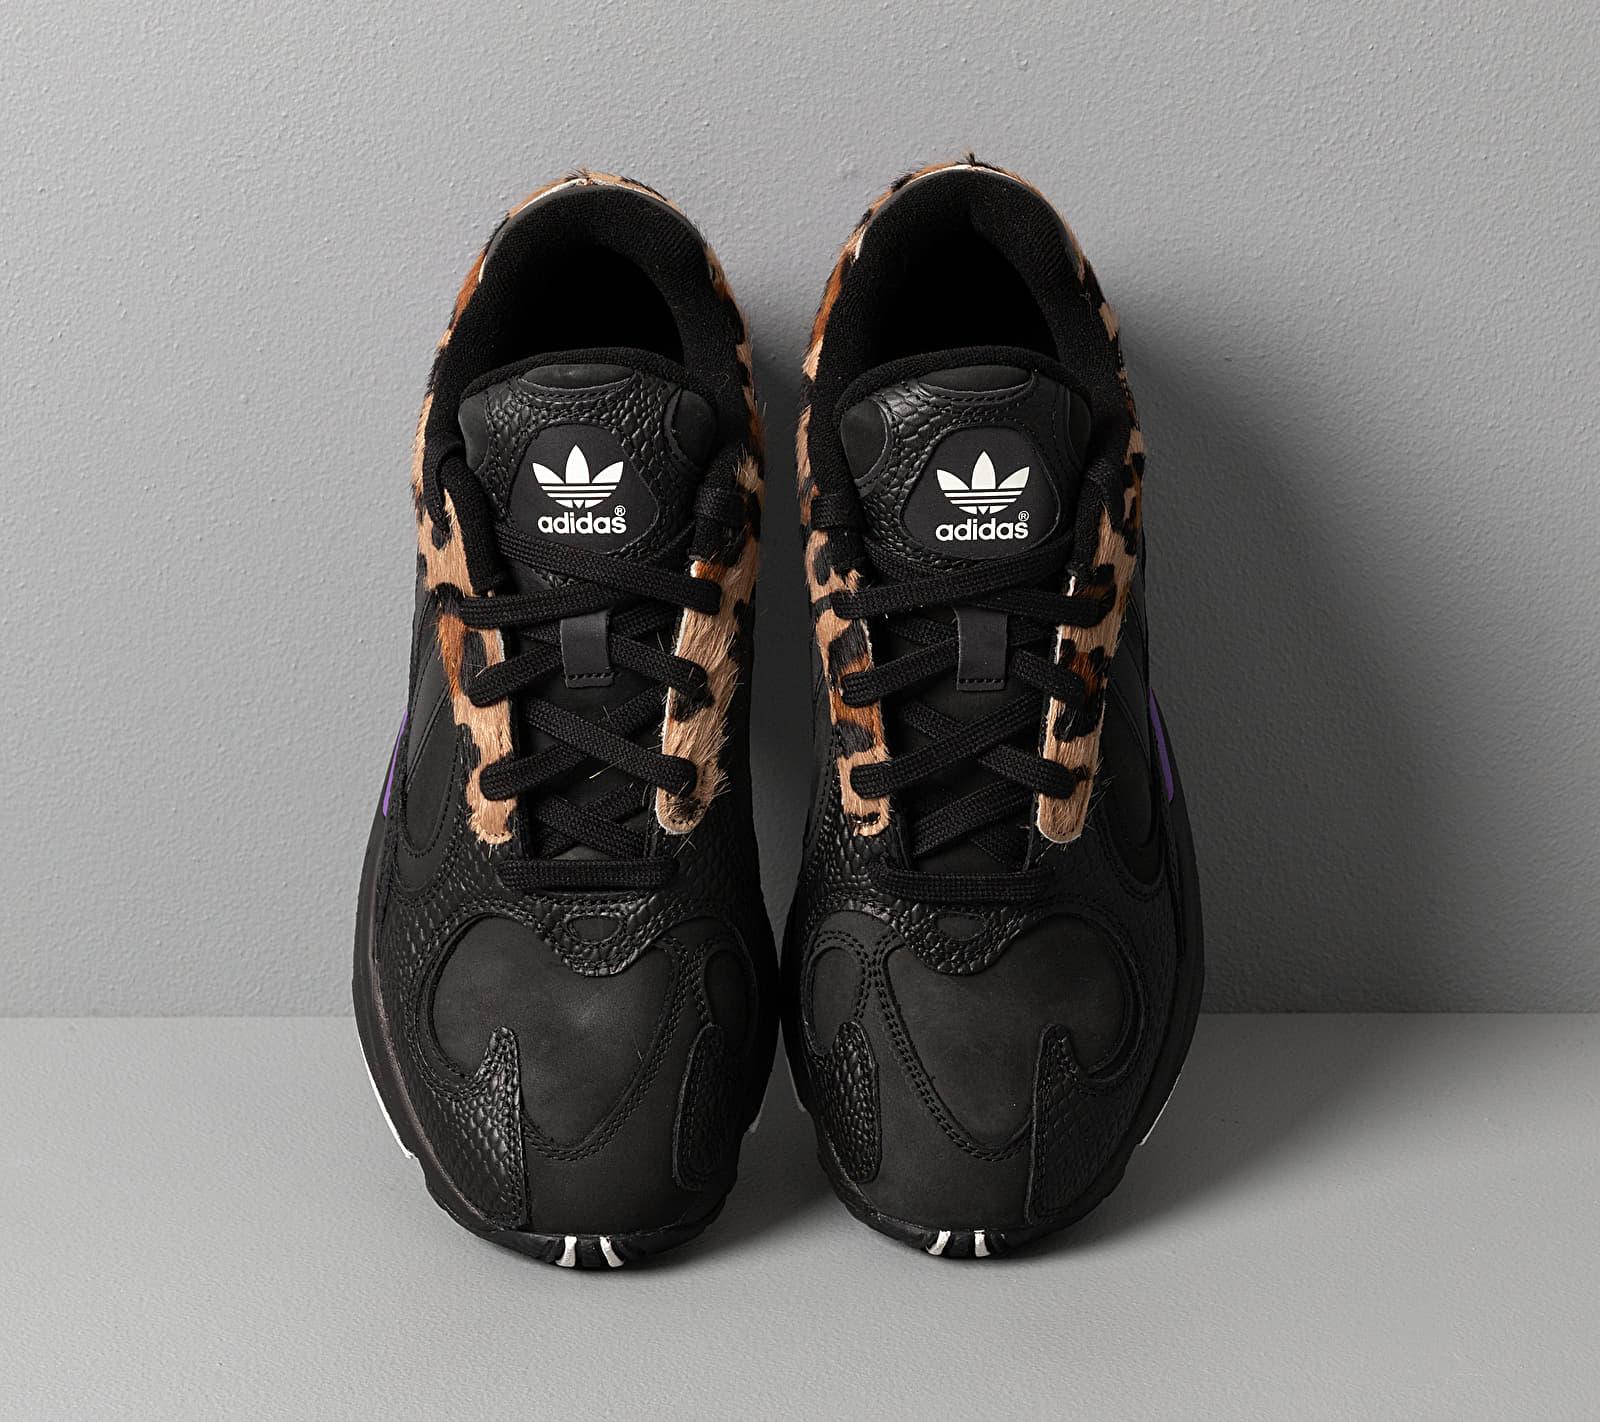 adidas Yung-1 Core Black/ Core Black/ Core Black